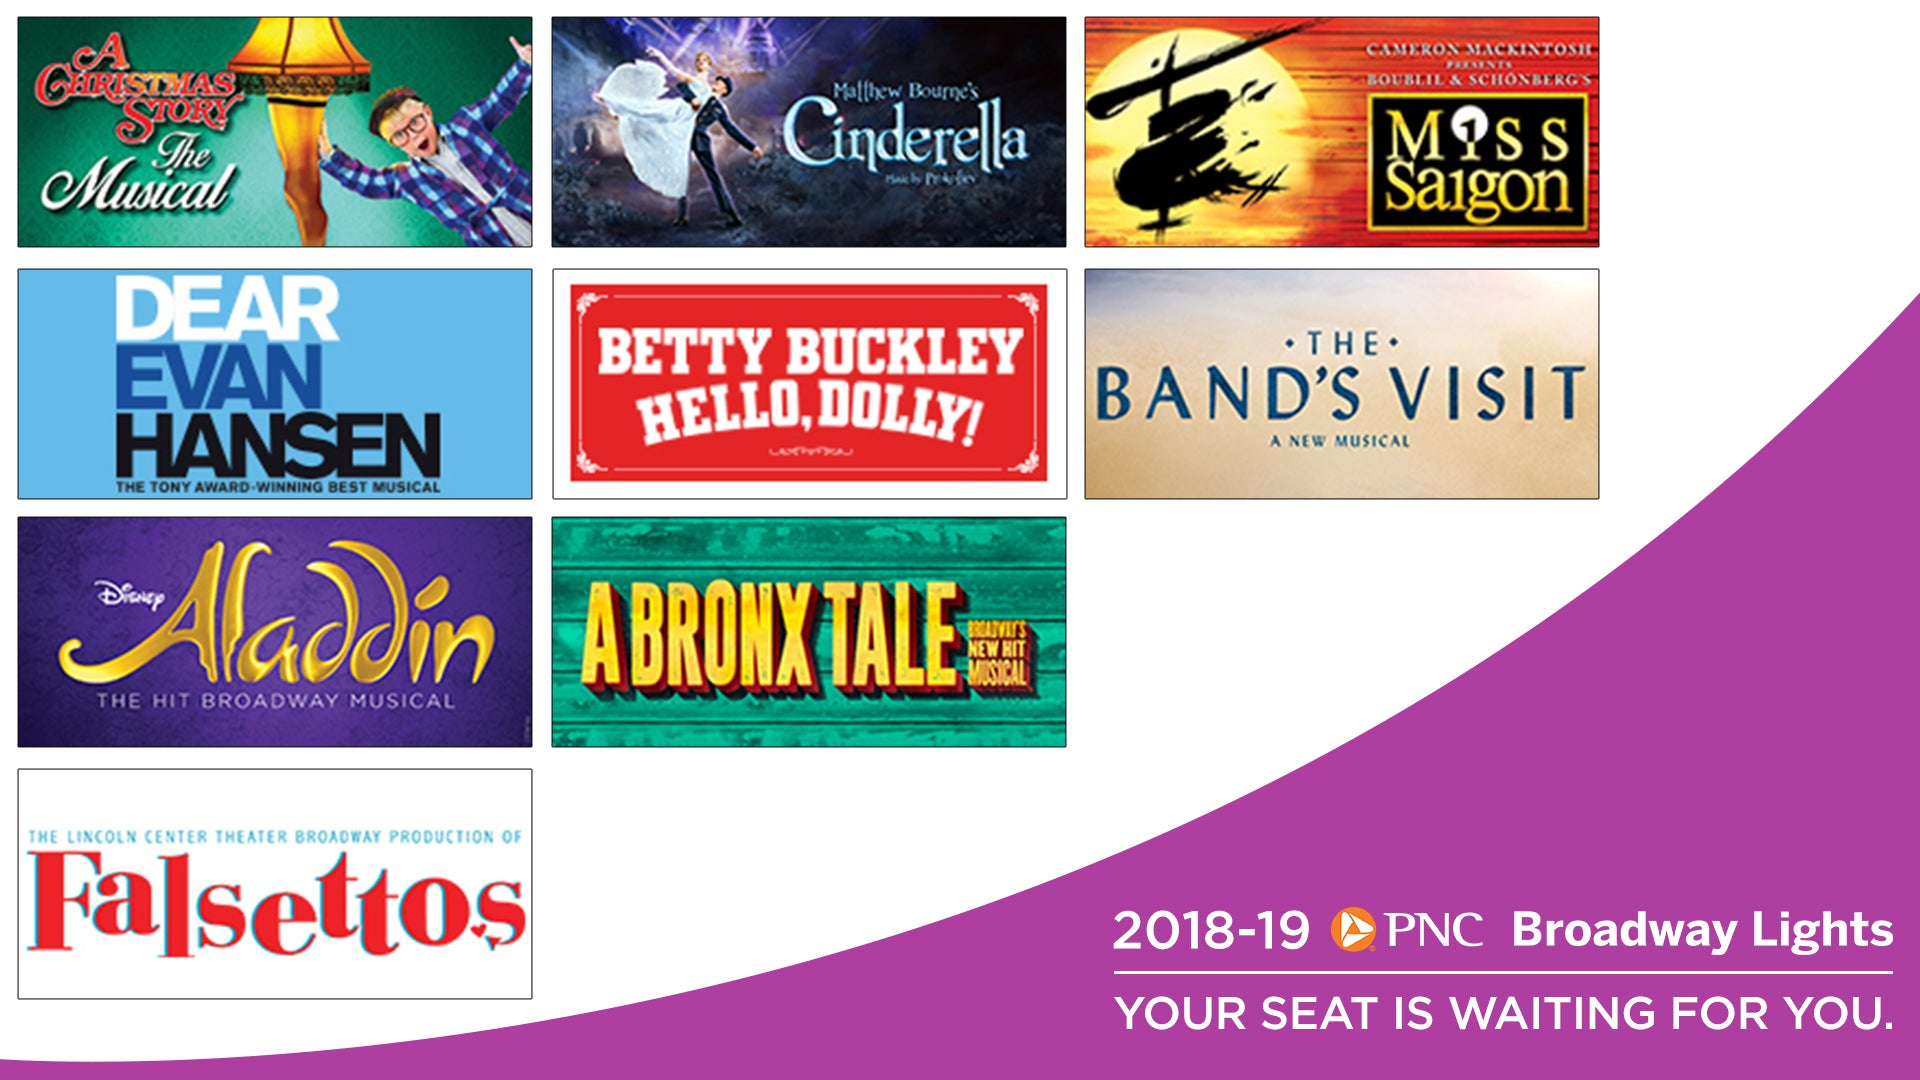 Delightful PNC Broadway Lights Announces New Season Including Disneyu0027s Aladdin And  2017 Tony® Award Winners Dear Evan Hanson And Hello, Dolly! Good Ideas